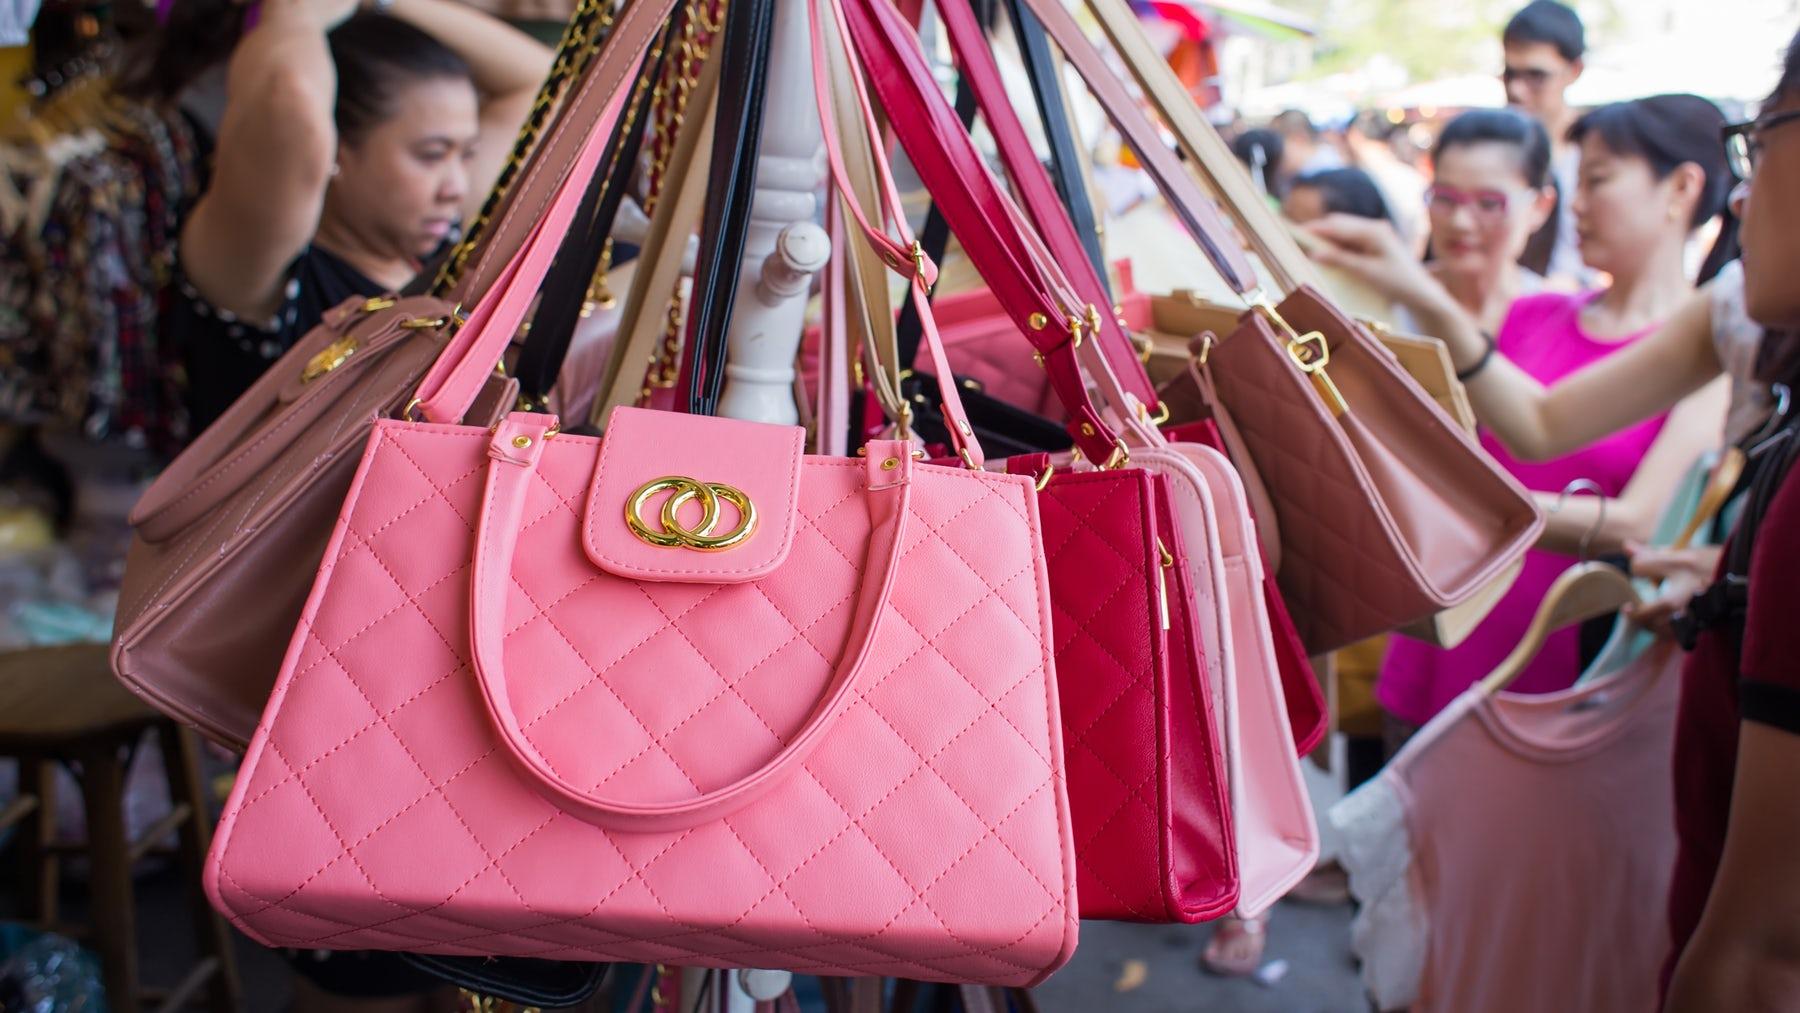 Counterfeit handbags on display in Bangkok, Thailand | Source: Shutterstock